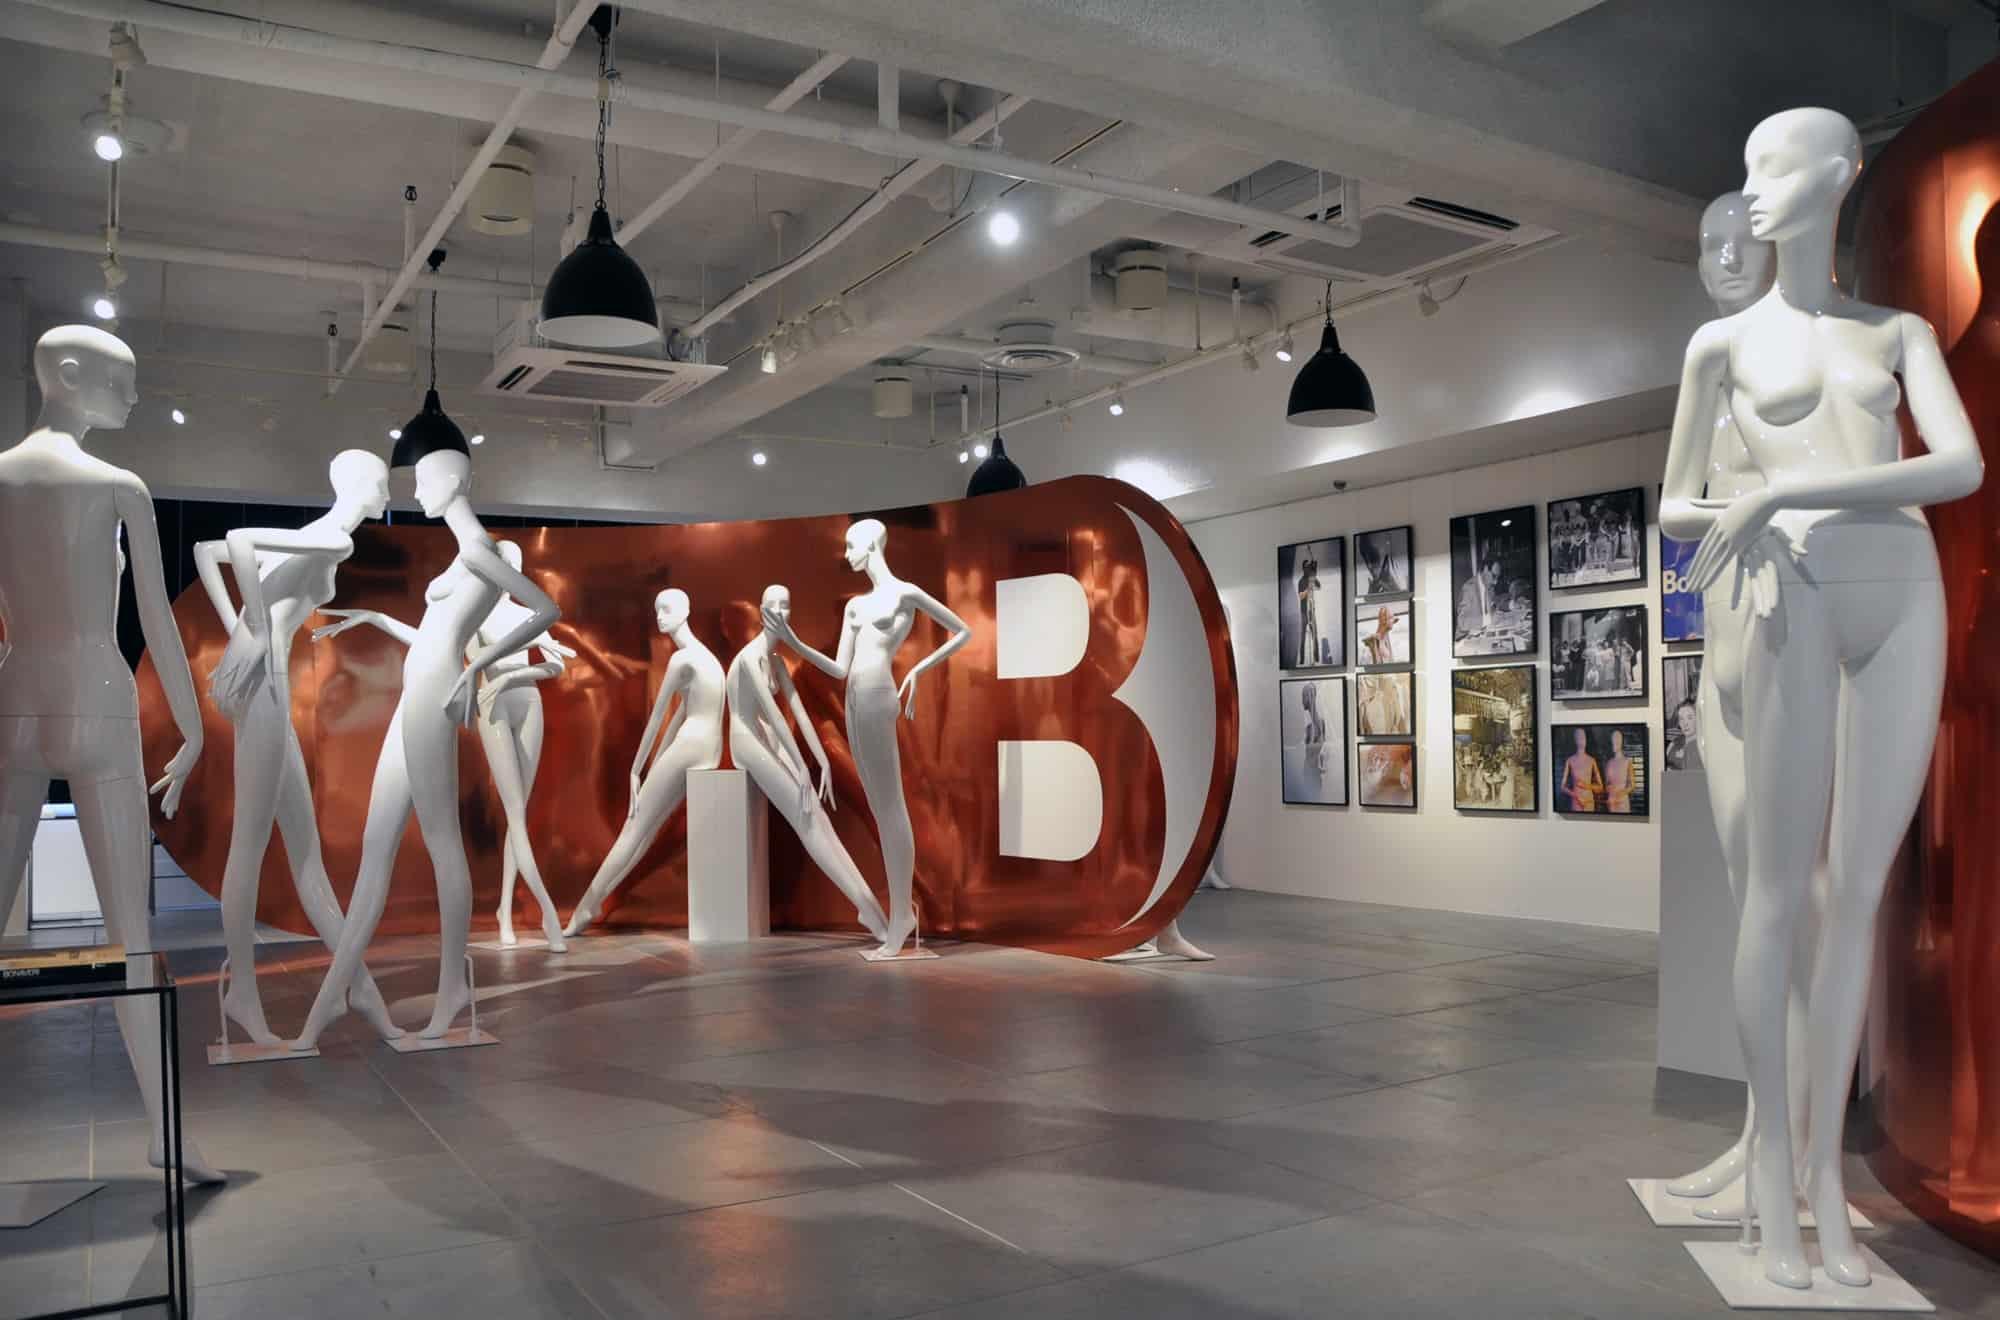 bonaveri mannequin exhibition tokyo japan 09